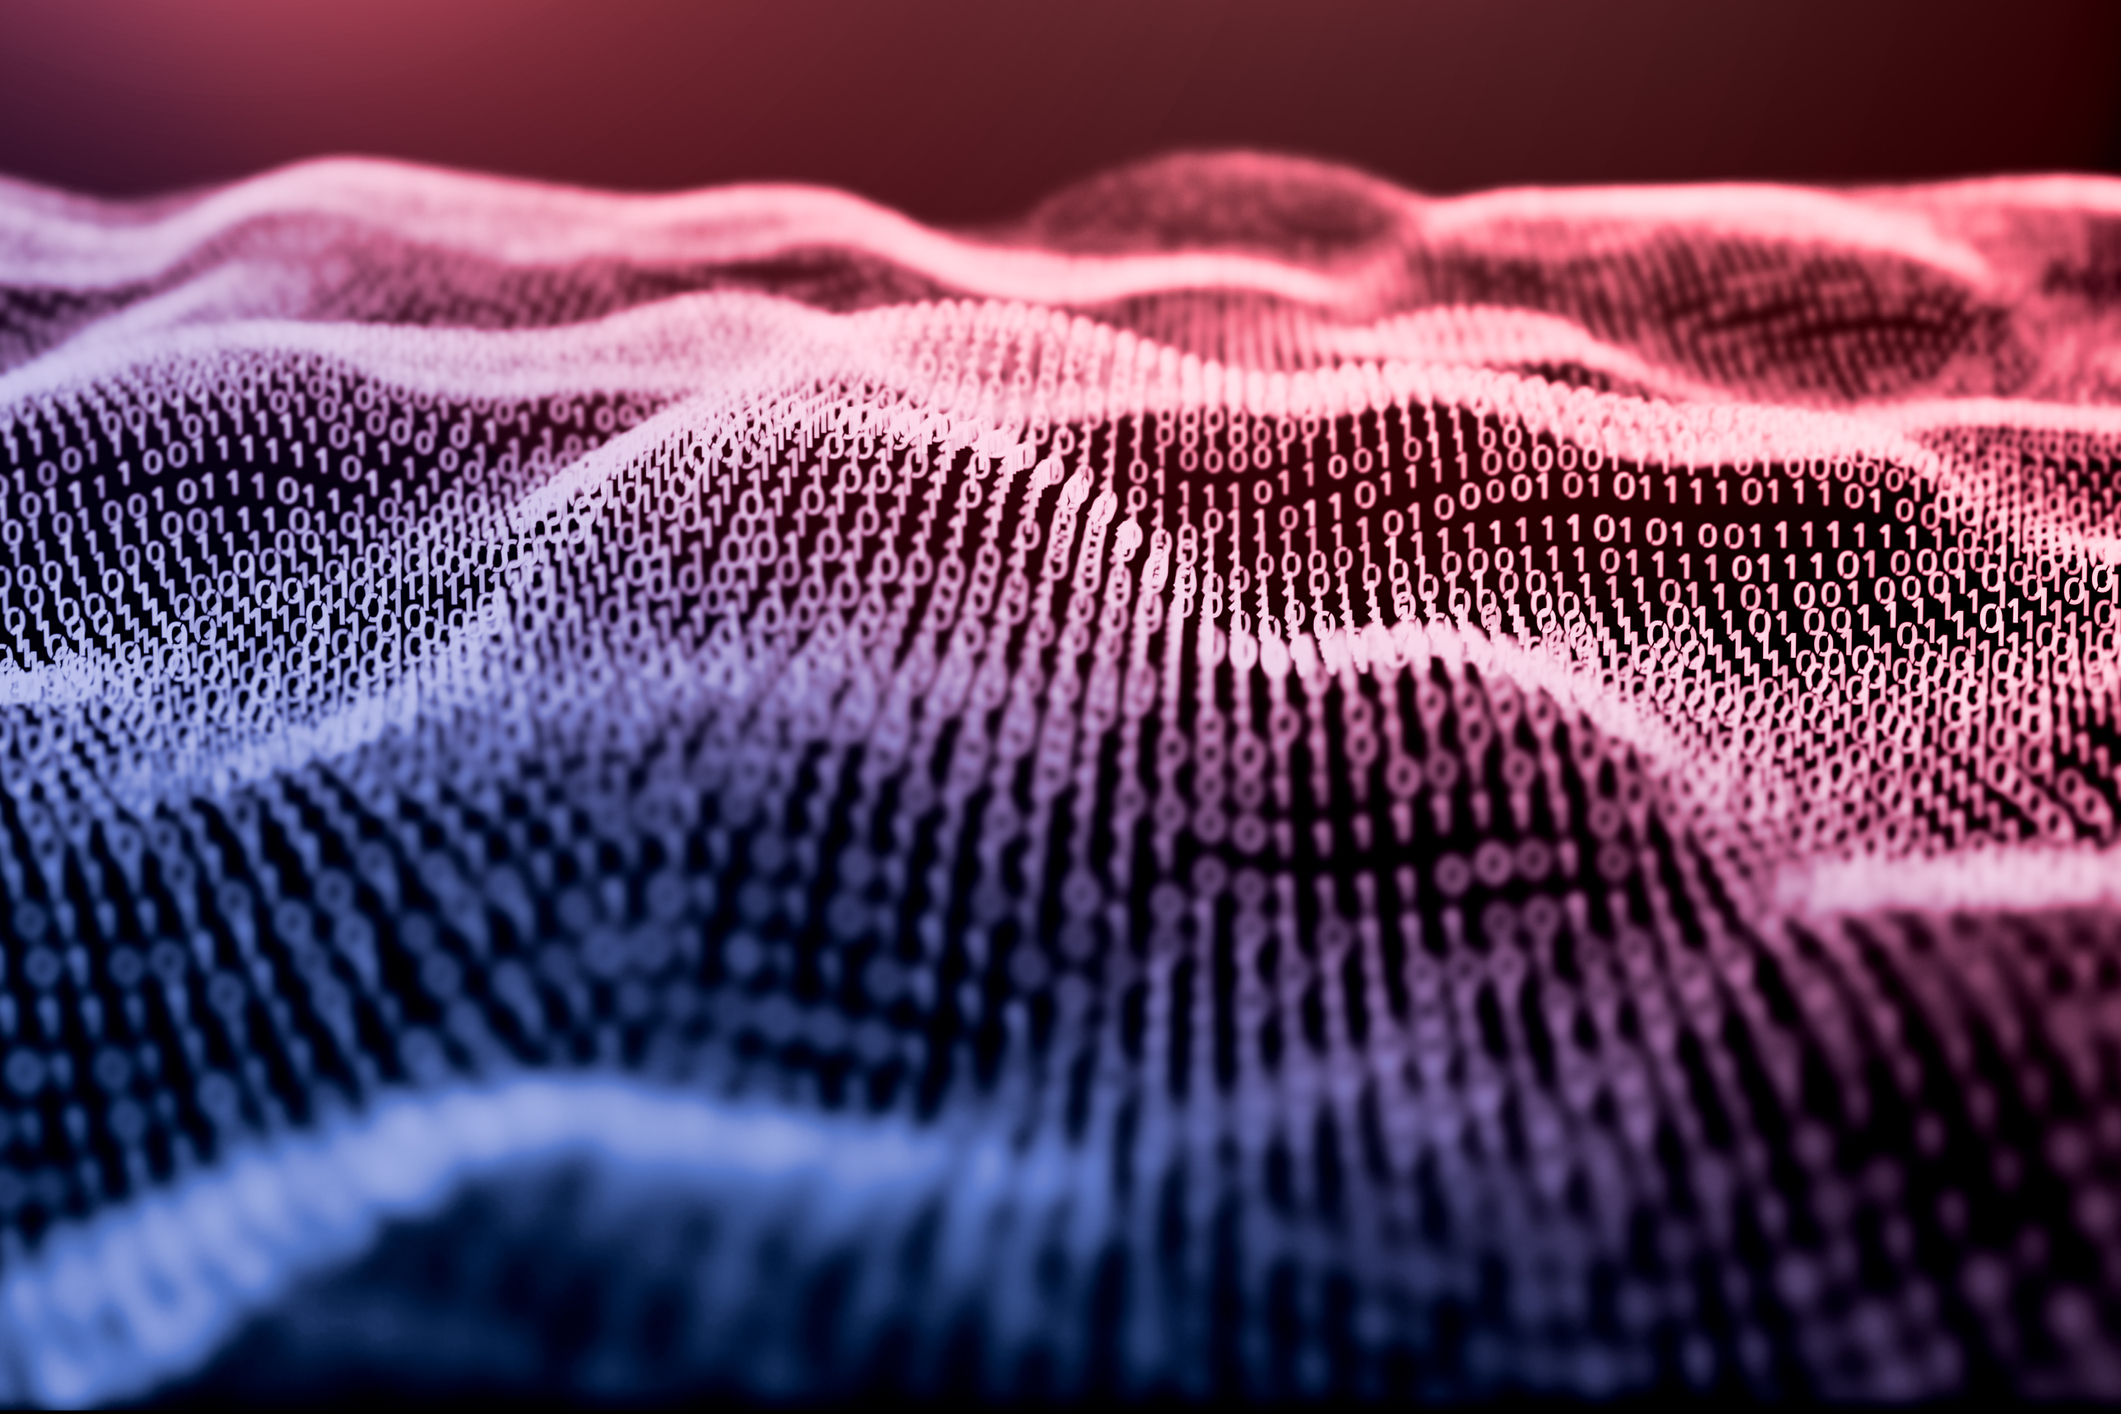 3D illustration Rendering of binary code pattern